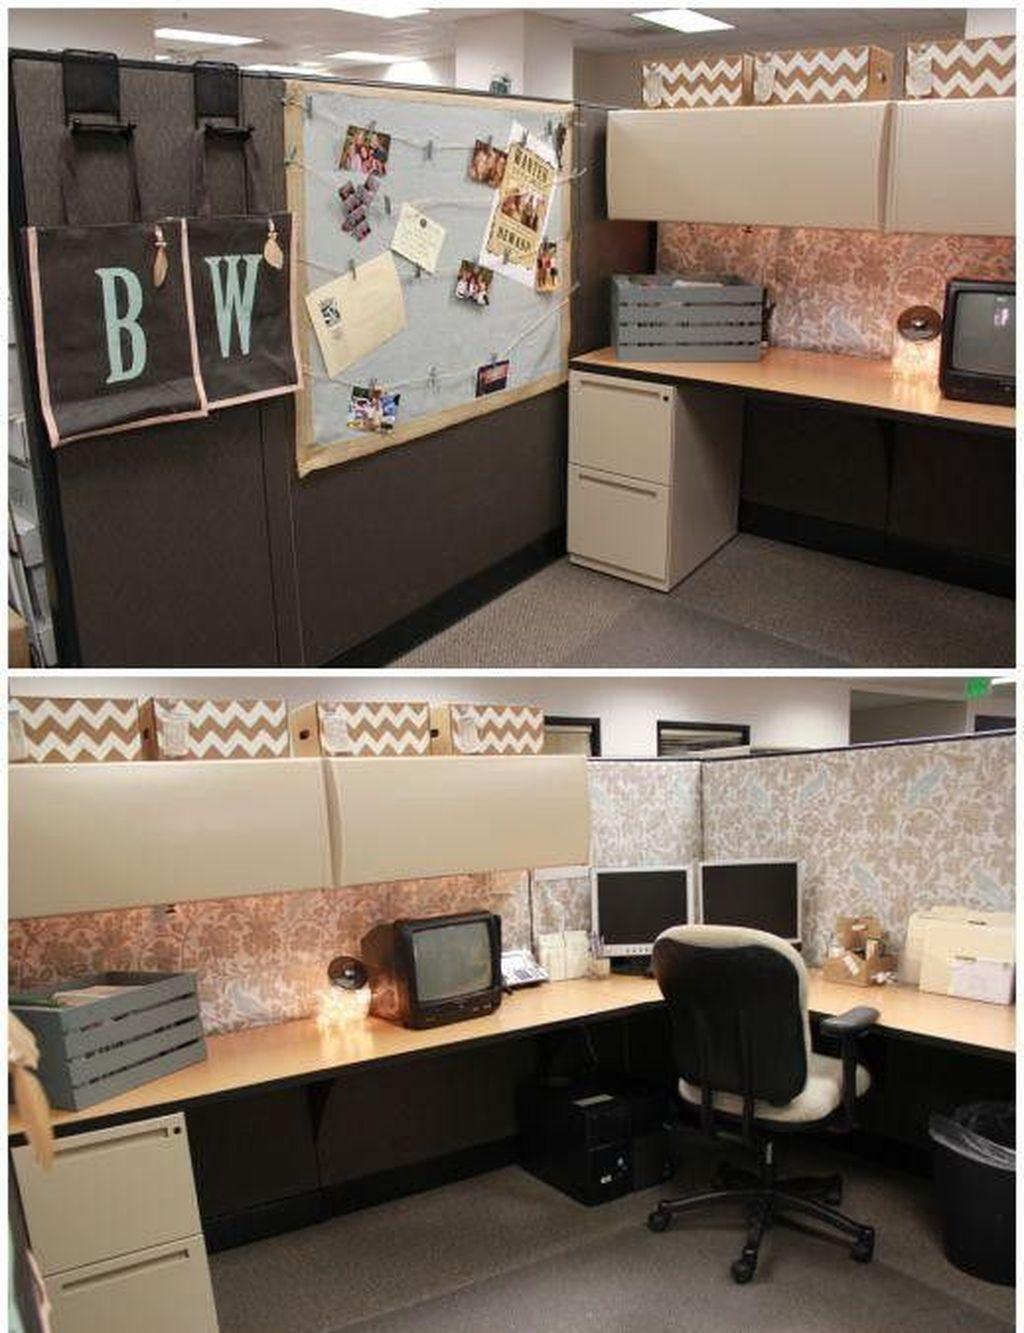 46 Inspiring Office Cubicle Decoration Ideas Cubicle Decor Office Office Cubicle Office Decor Professional